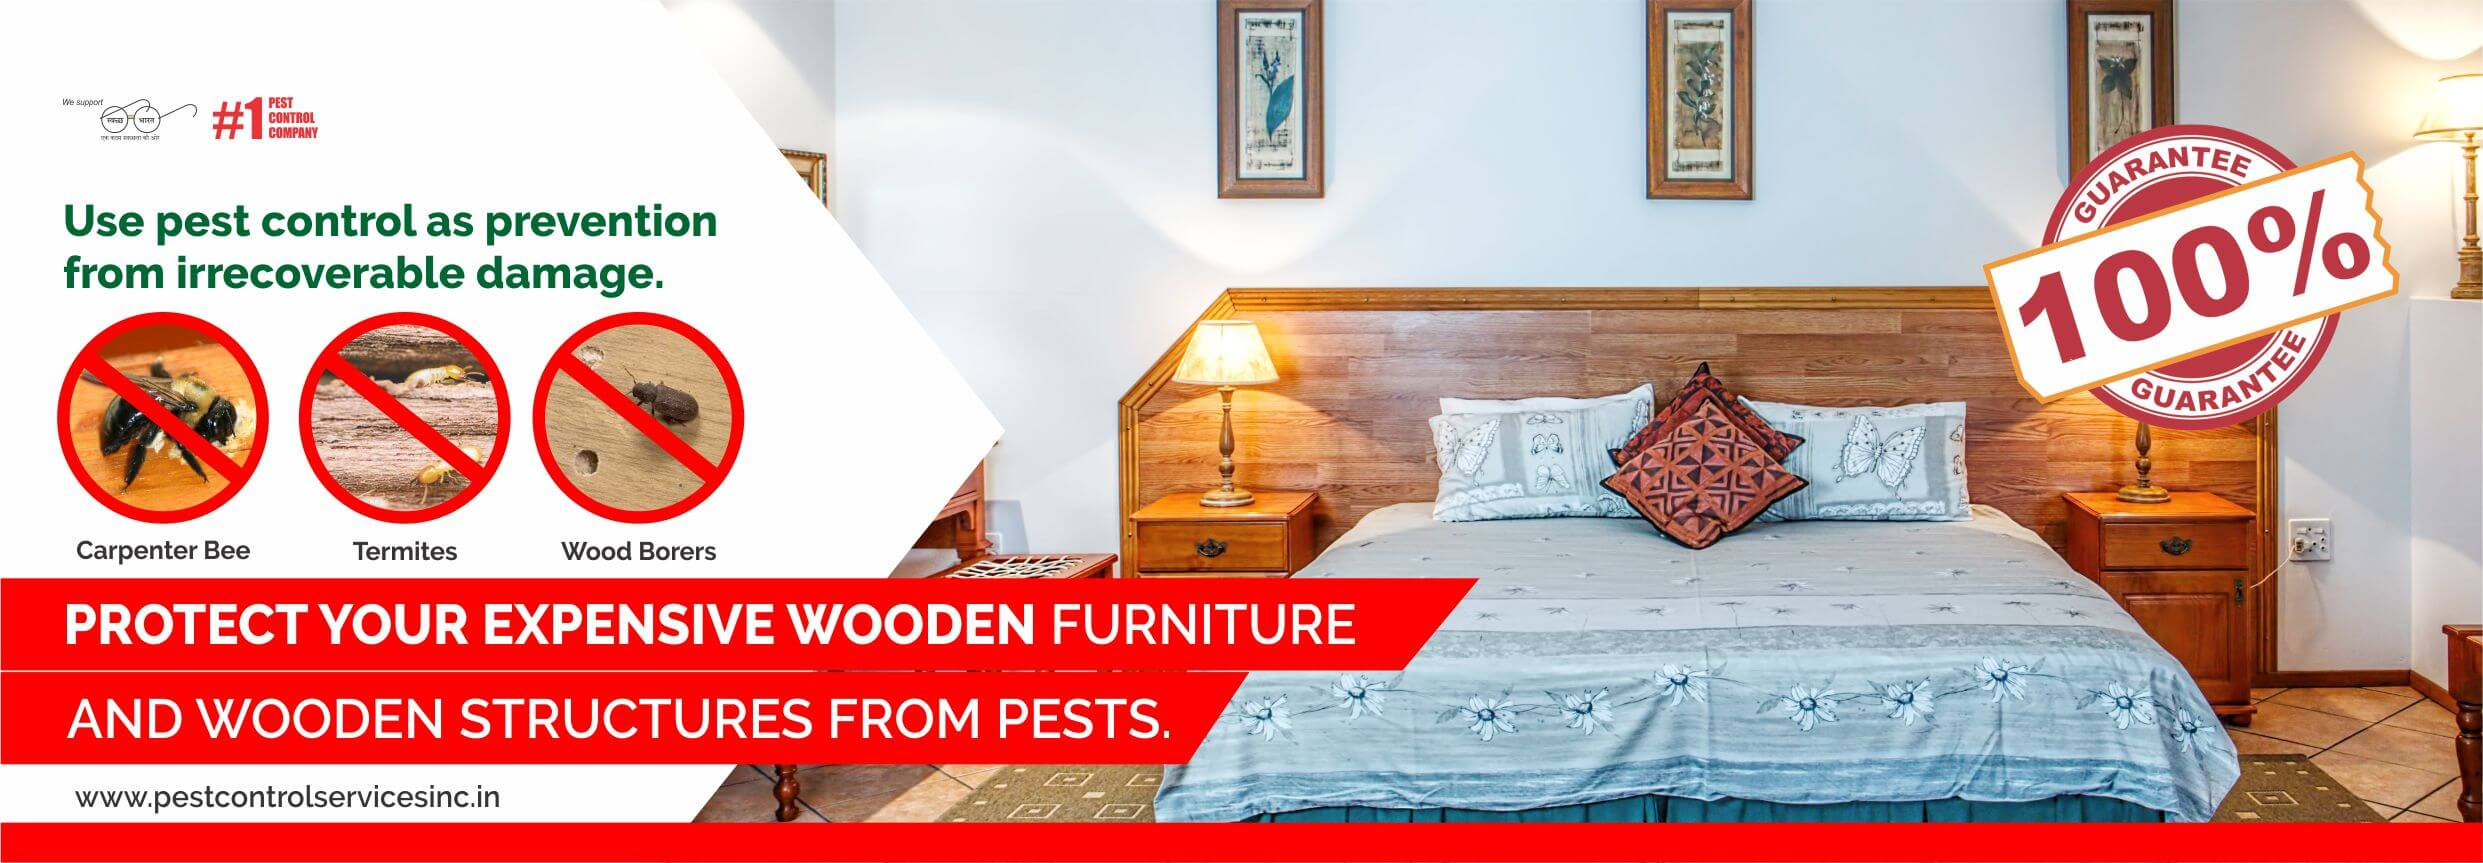 termite, wood borer pest contorl